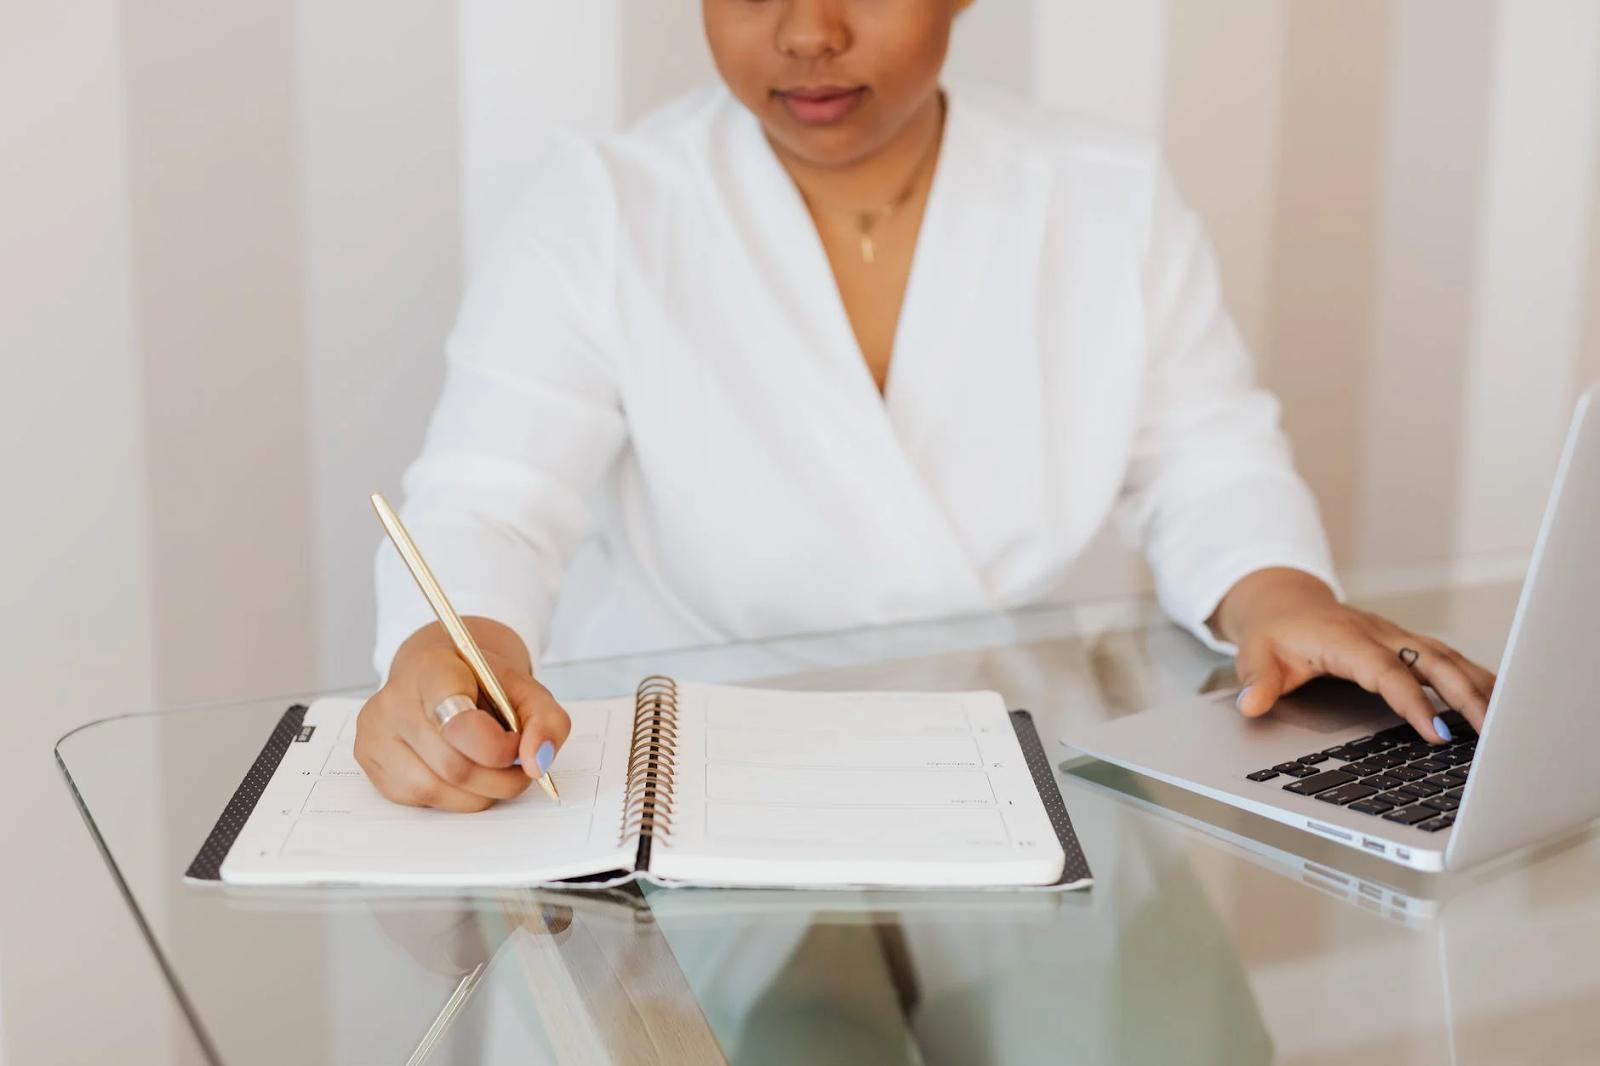 10 Important Things to Ask When Choosing a B2B Platform